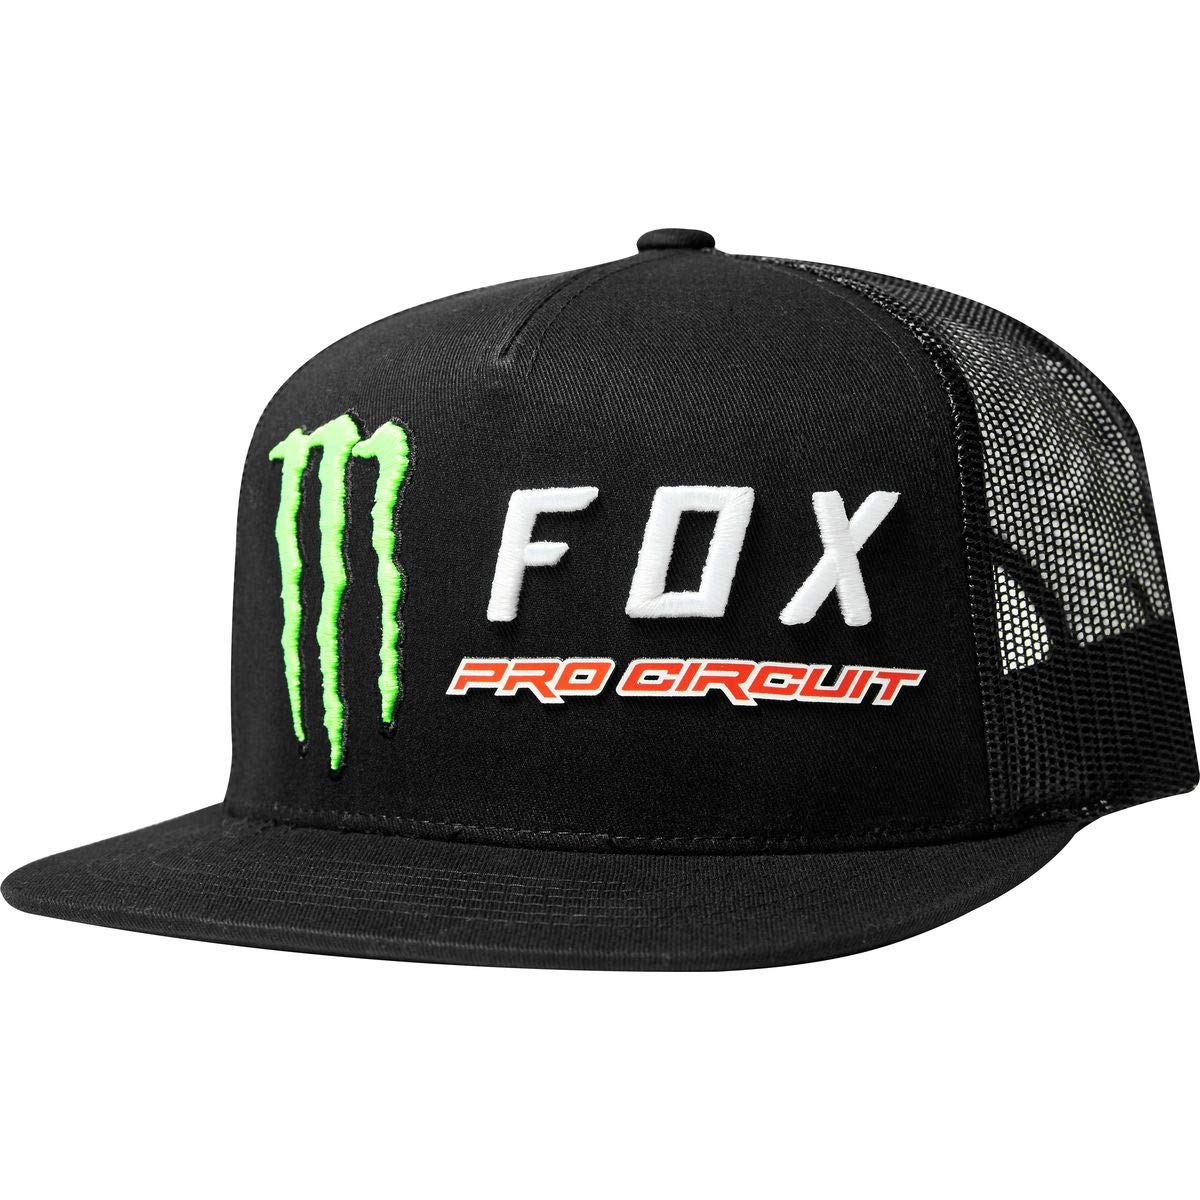 e599781f7f7 Amazon.com  Fox Racing Men s Monster PC Snapback Adjustable Hats